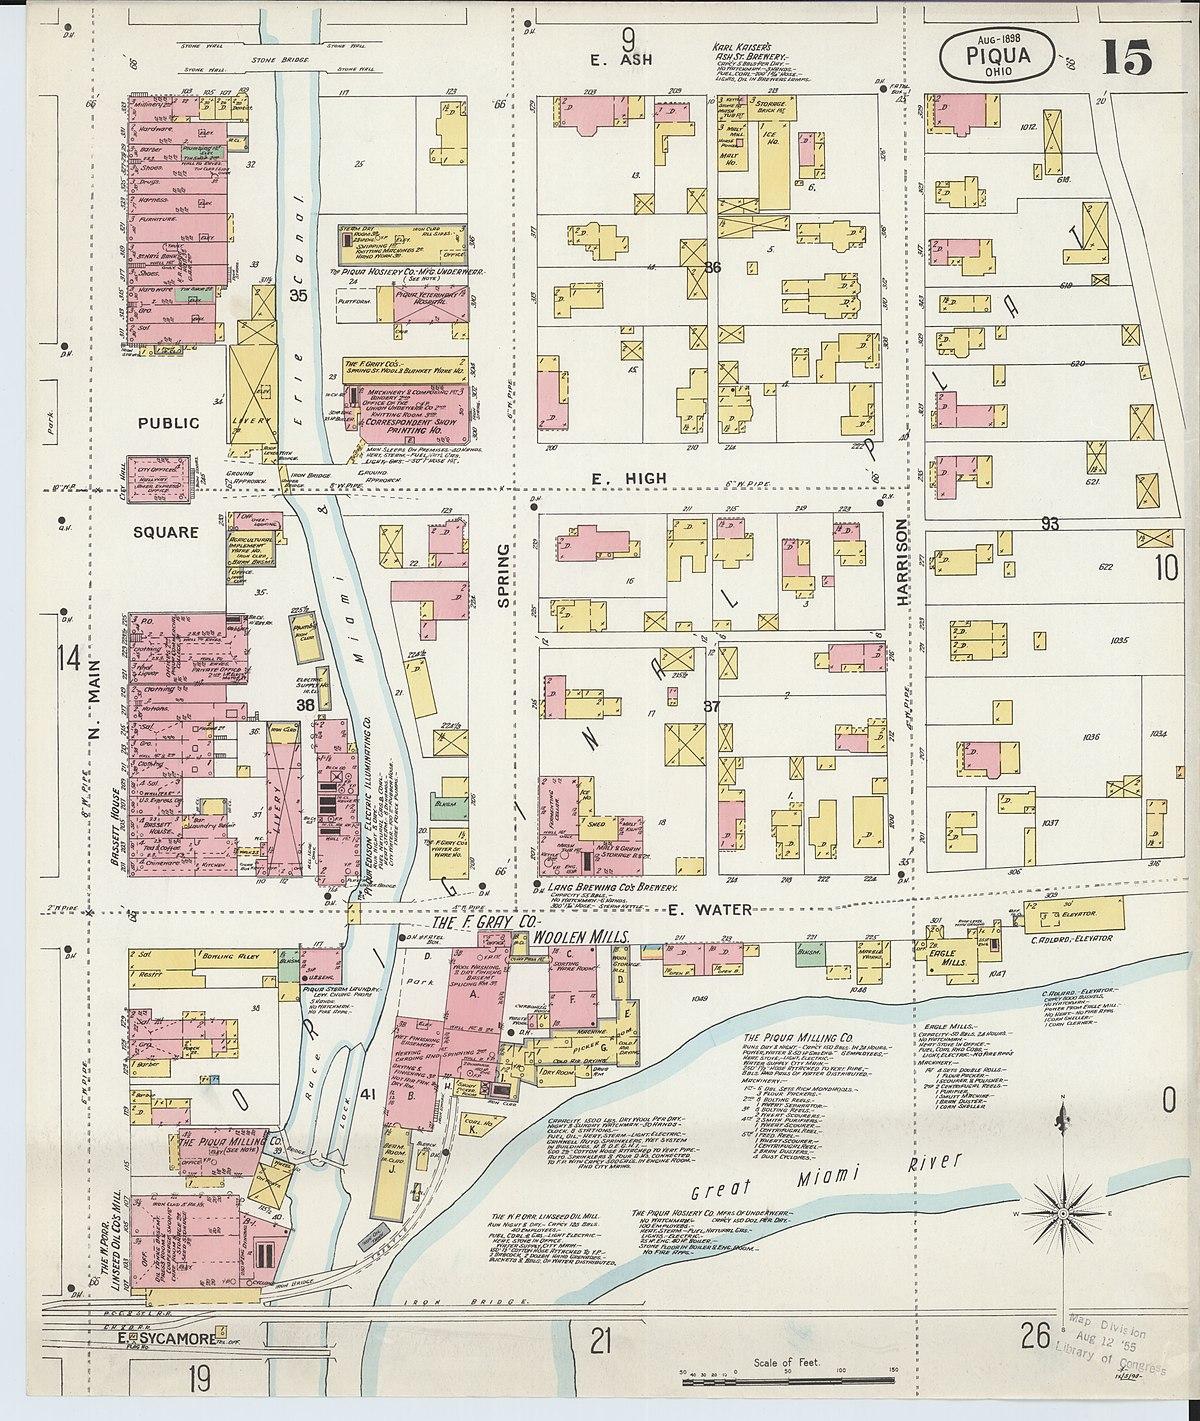 file:sanborn fire insurance map from piqua, miami county